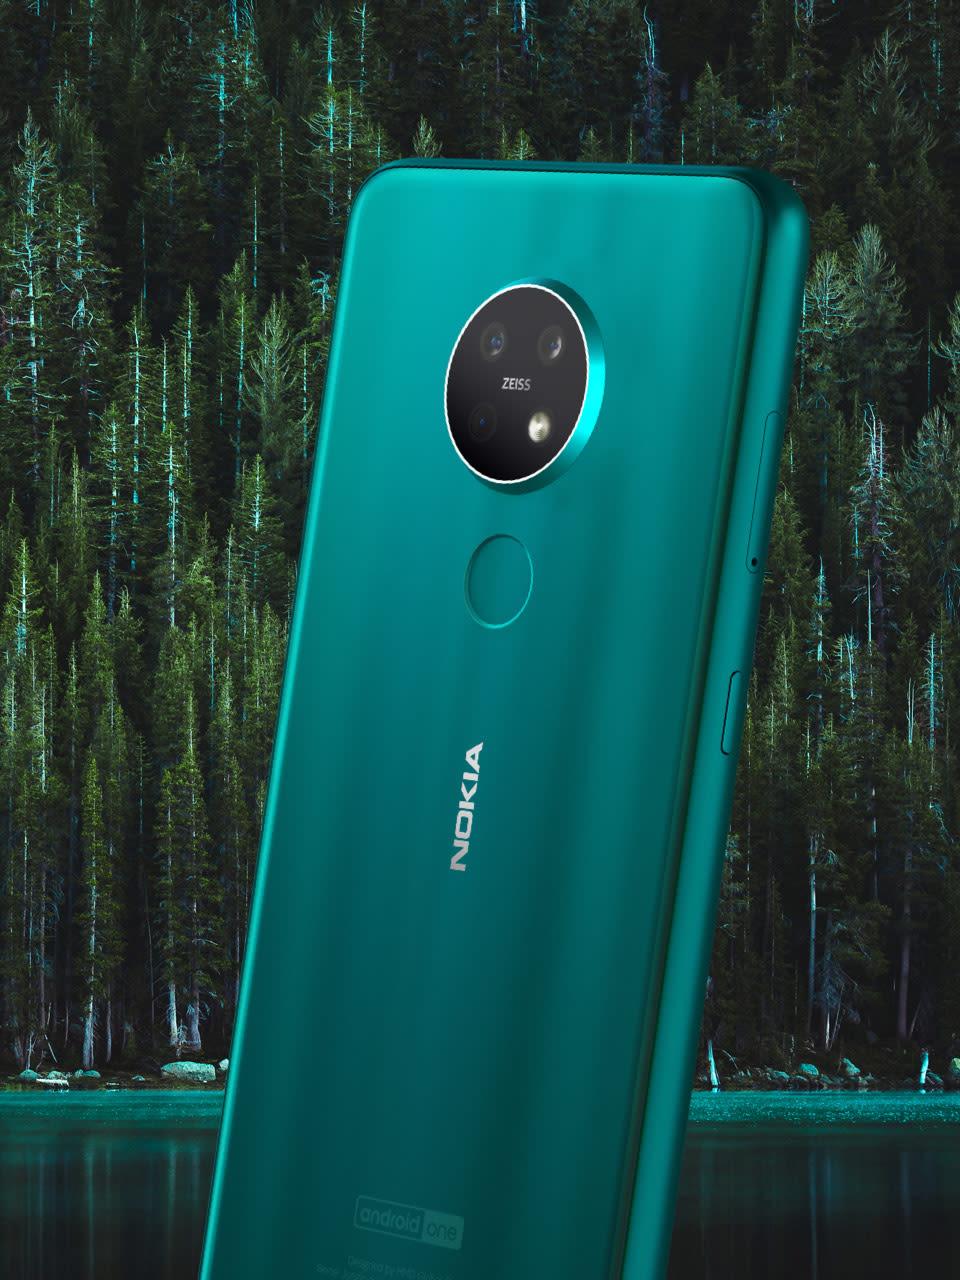 Nokia 7 2 | Nokia phones | International - English